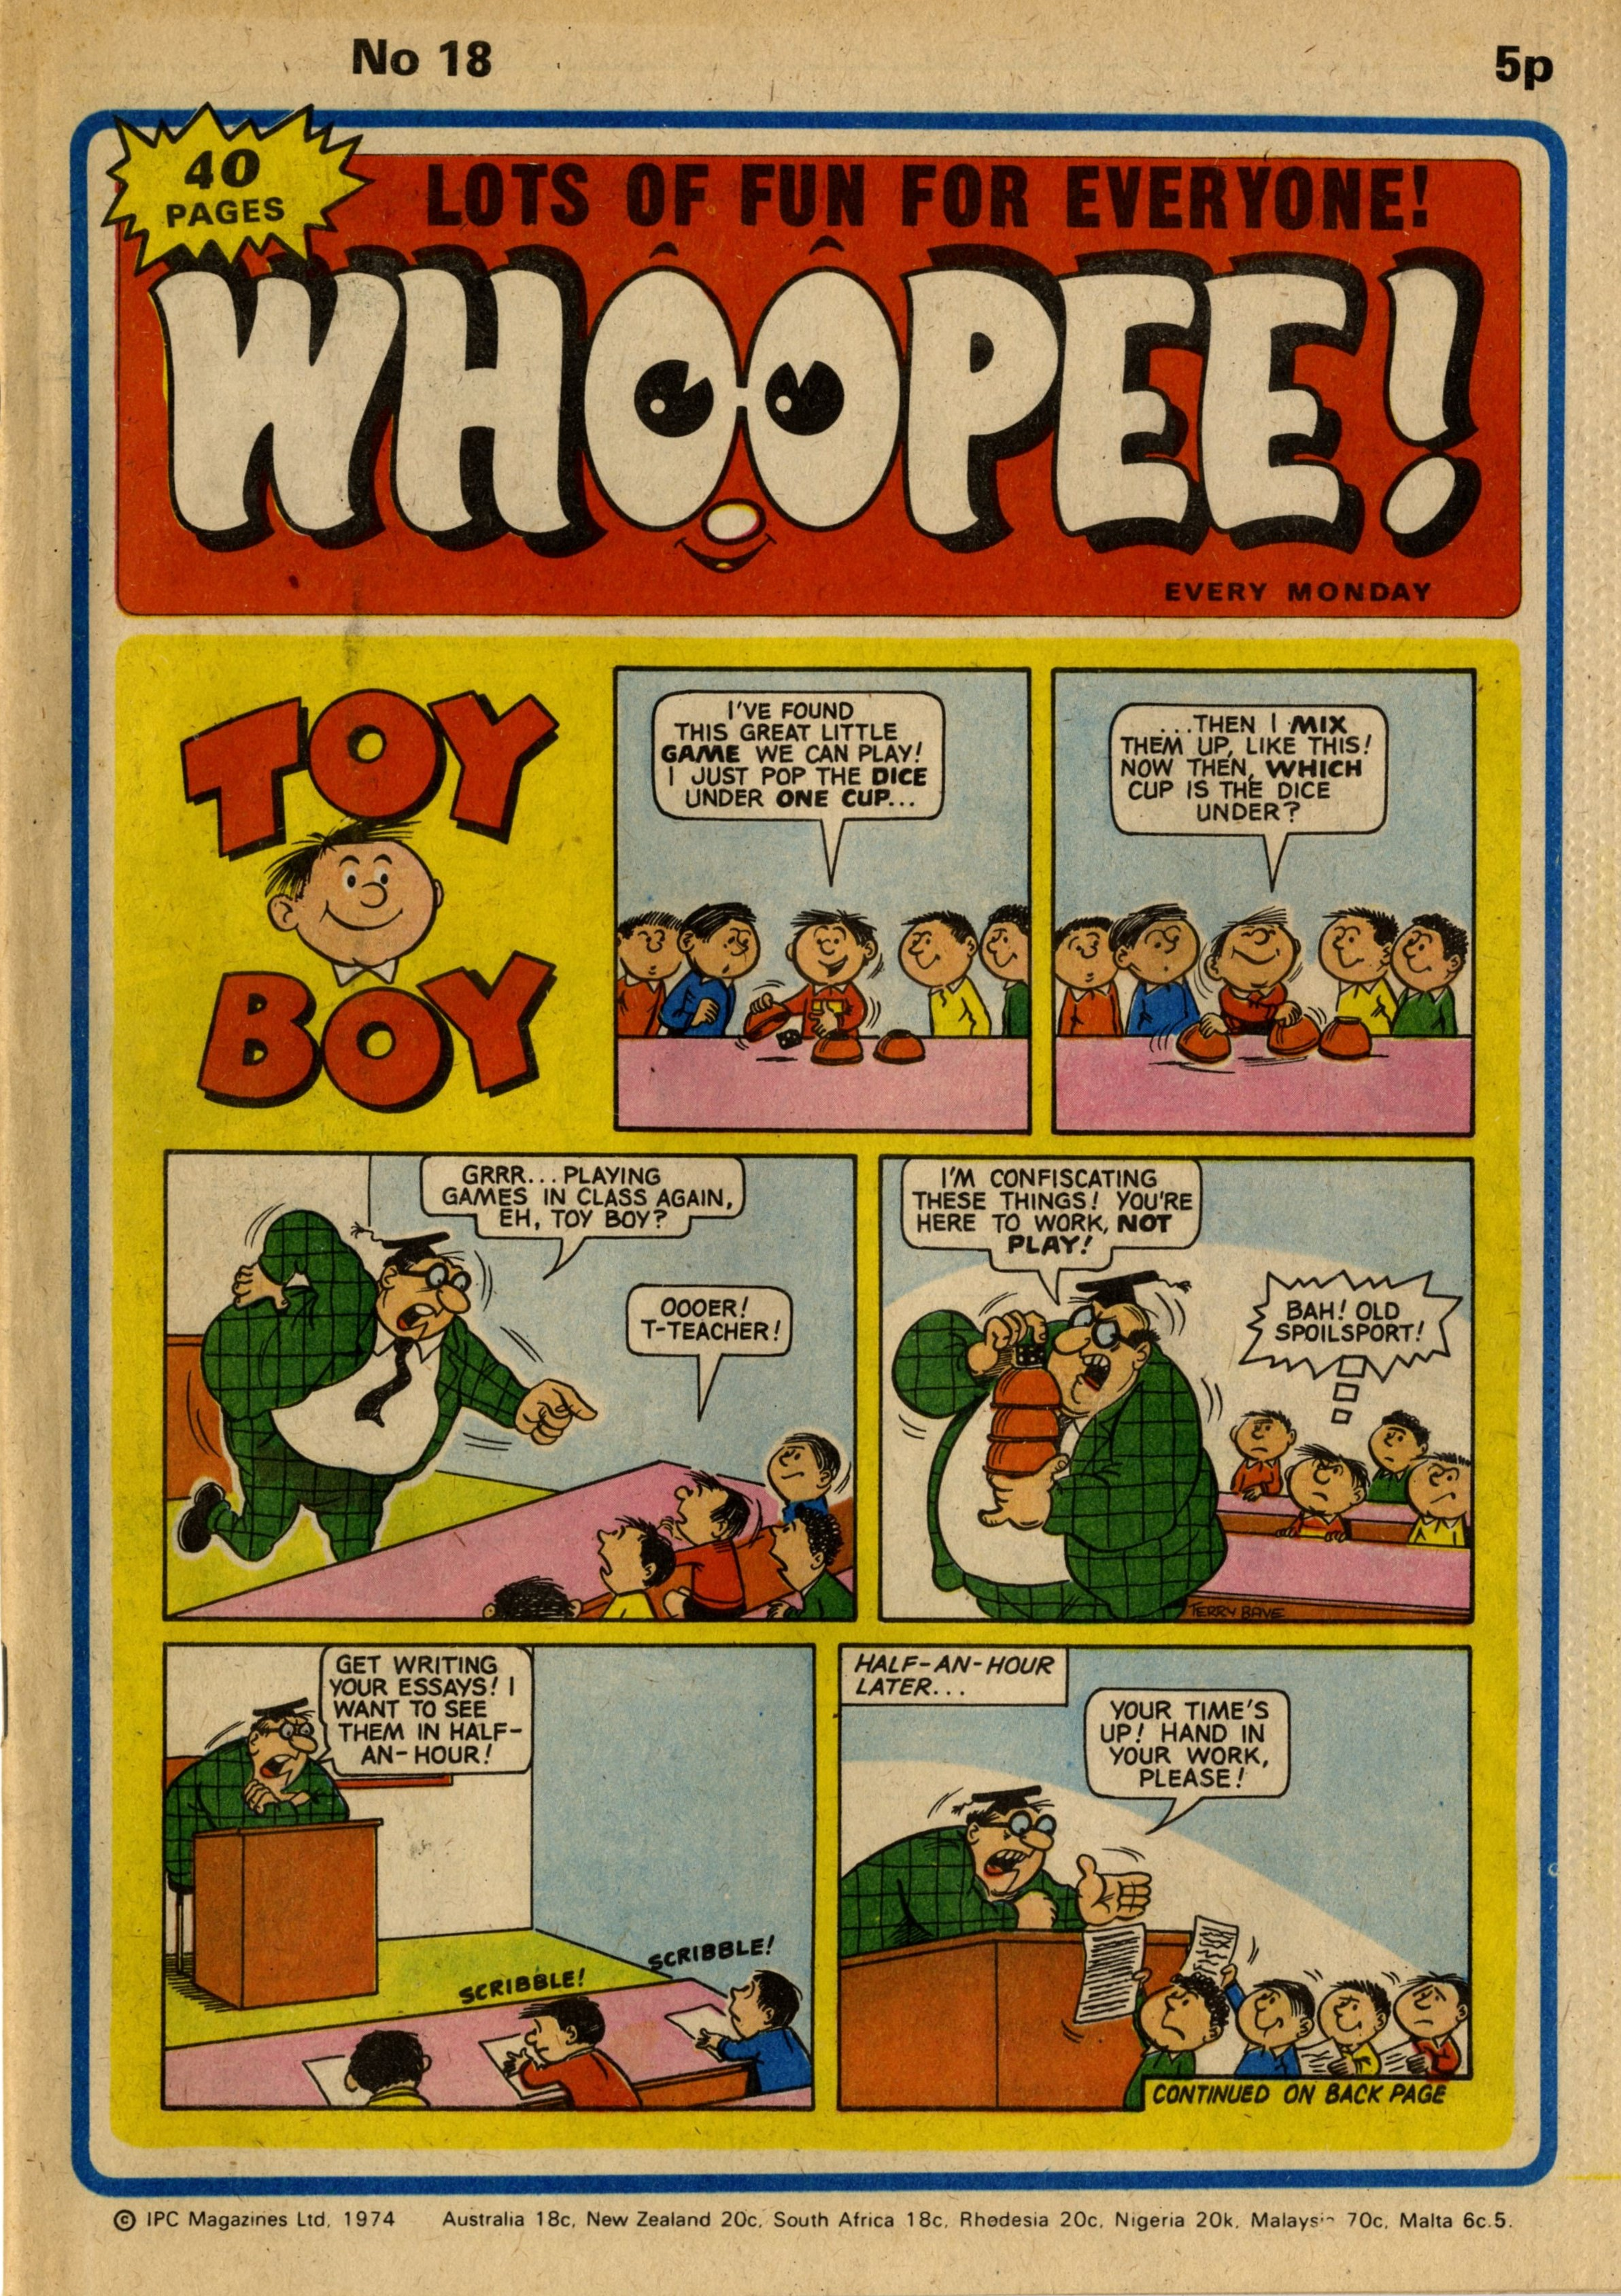 Toy Boy: Terry Bave (artist)